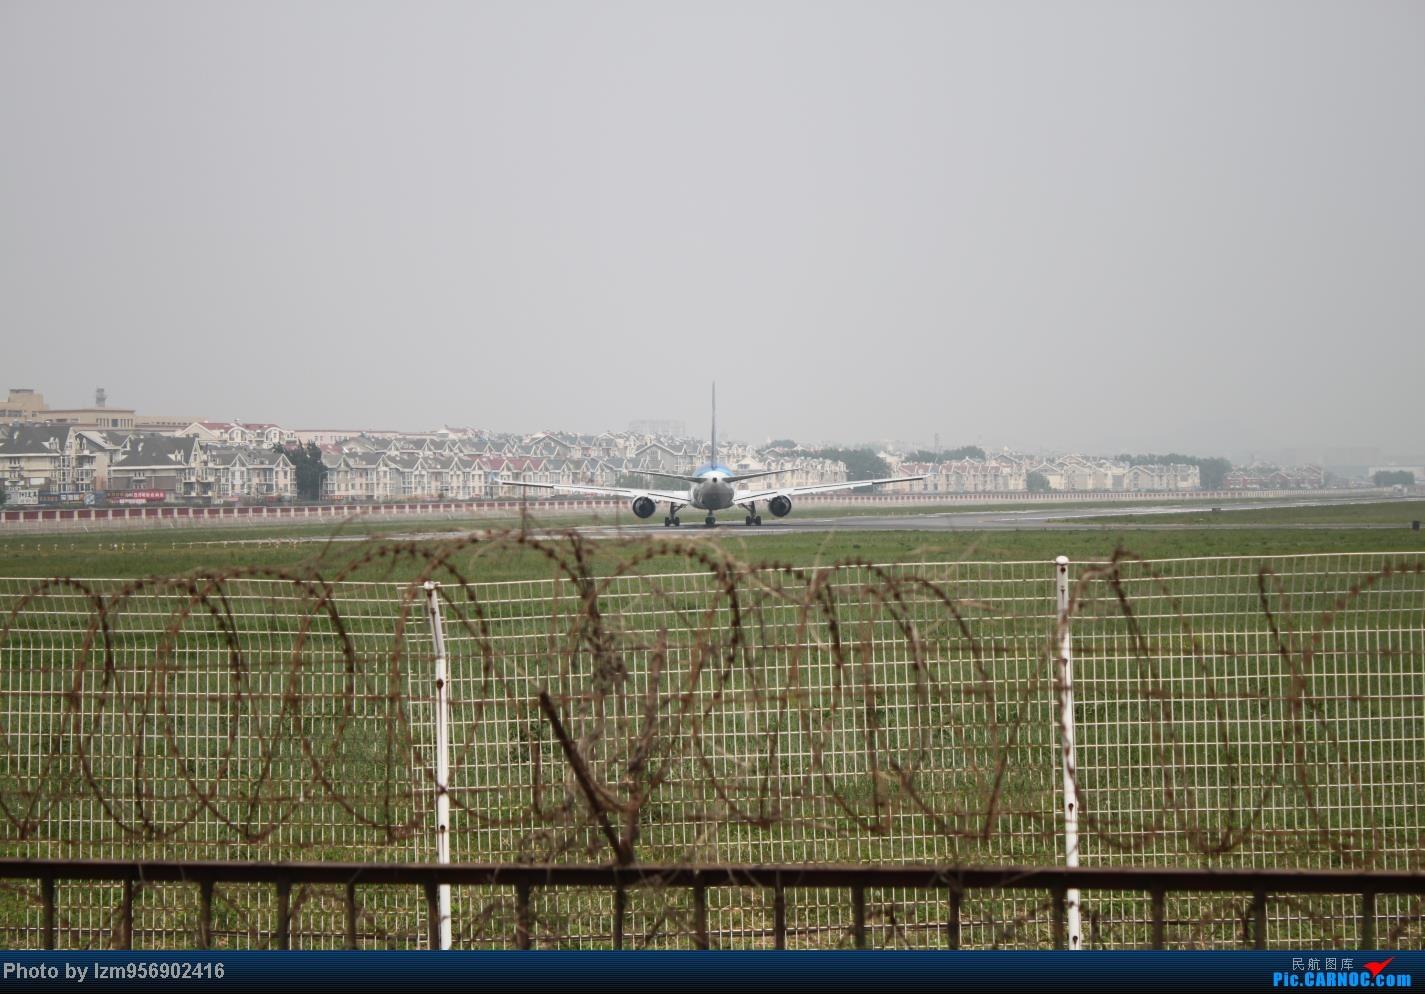 Re:[原创]DLC蹲点大半天,拍到了大棒航空772=w= BOEING 767-300 B-2296 中国大连周水子机场